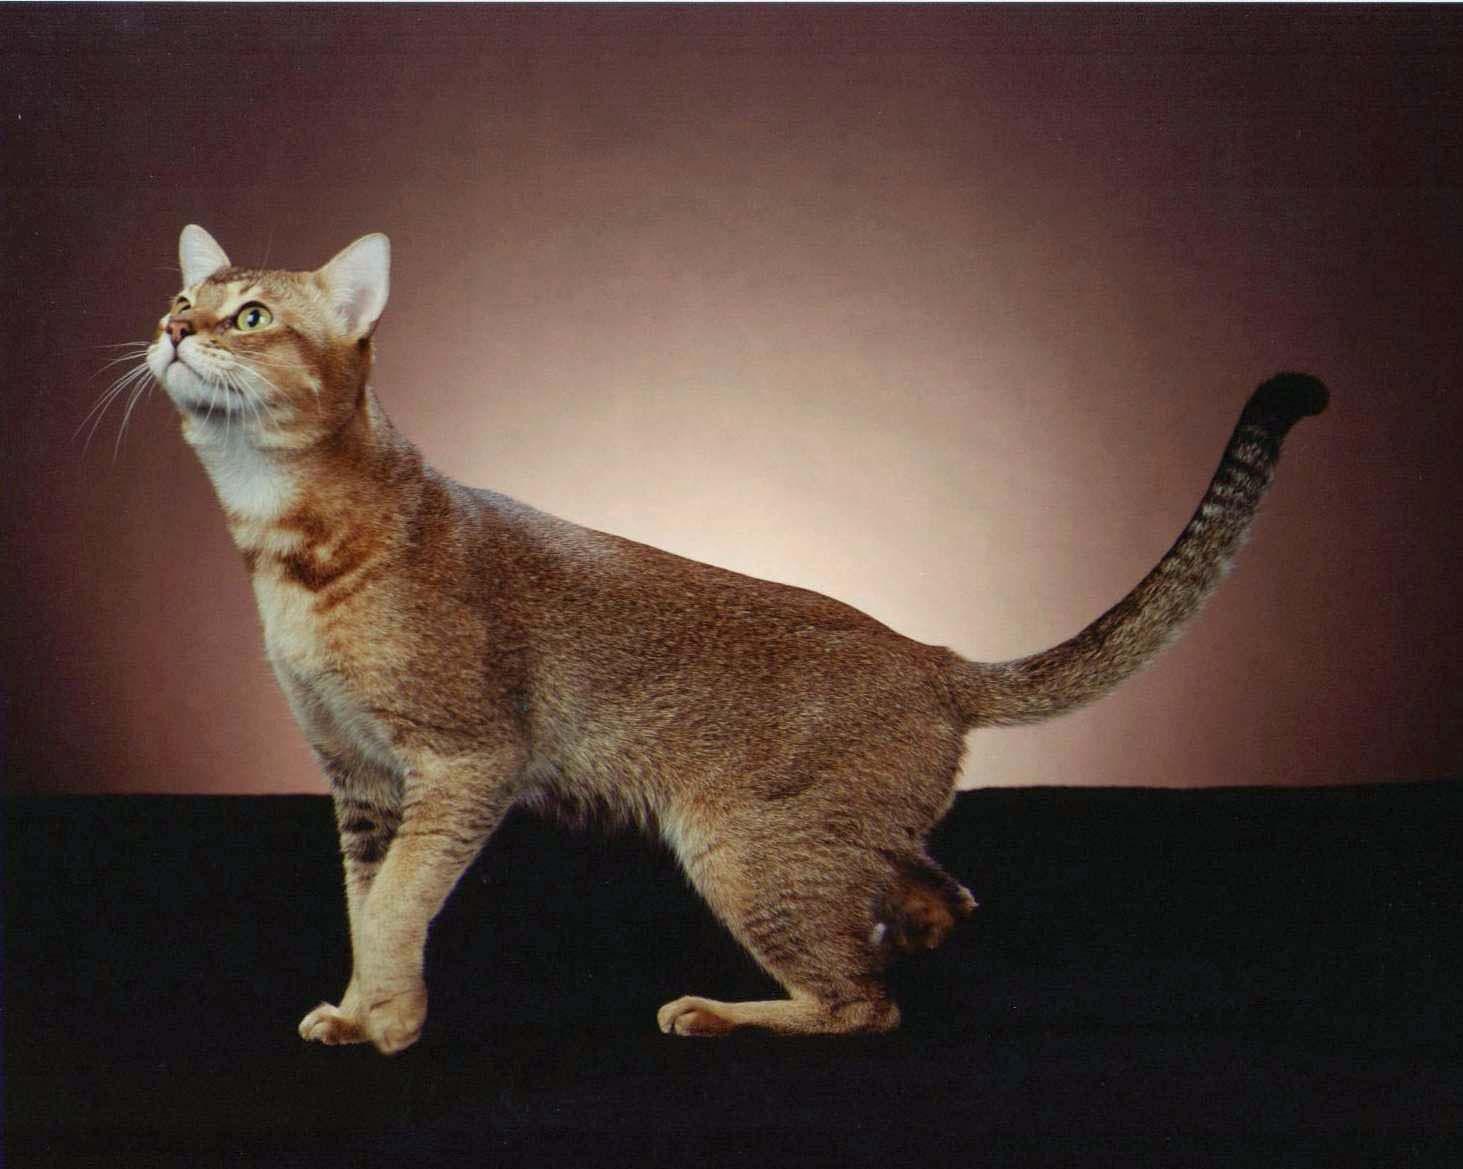 chausie stone cougar